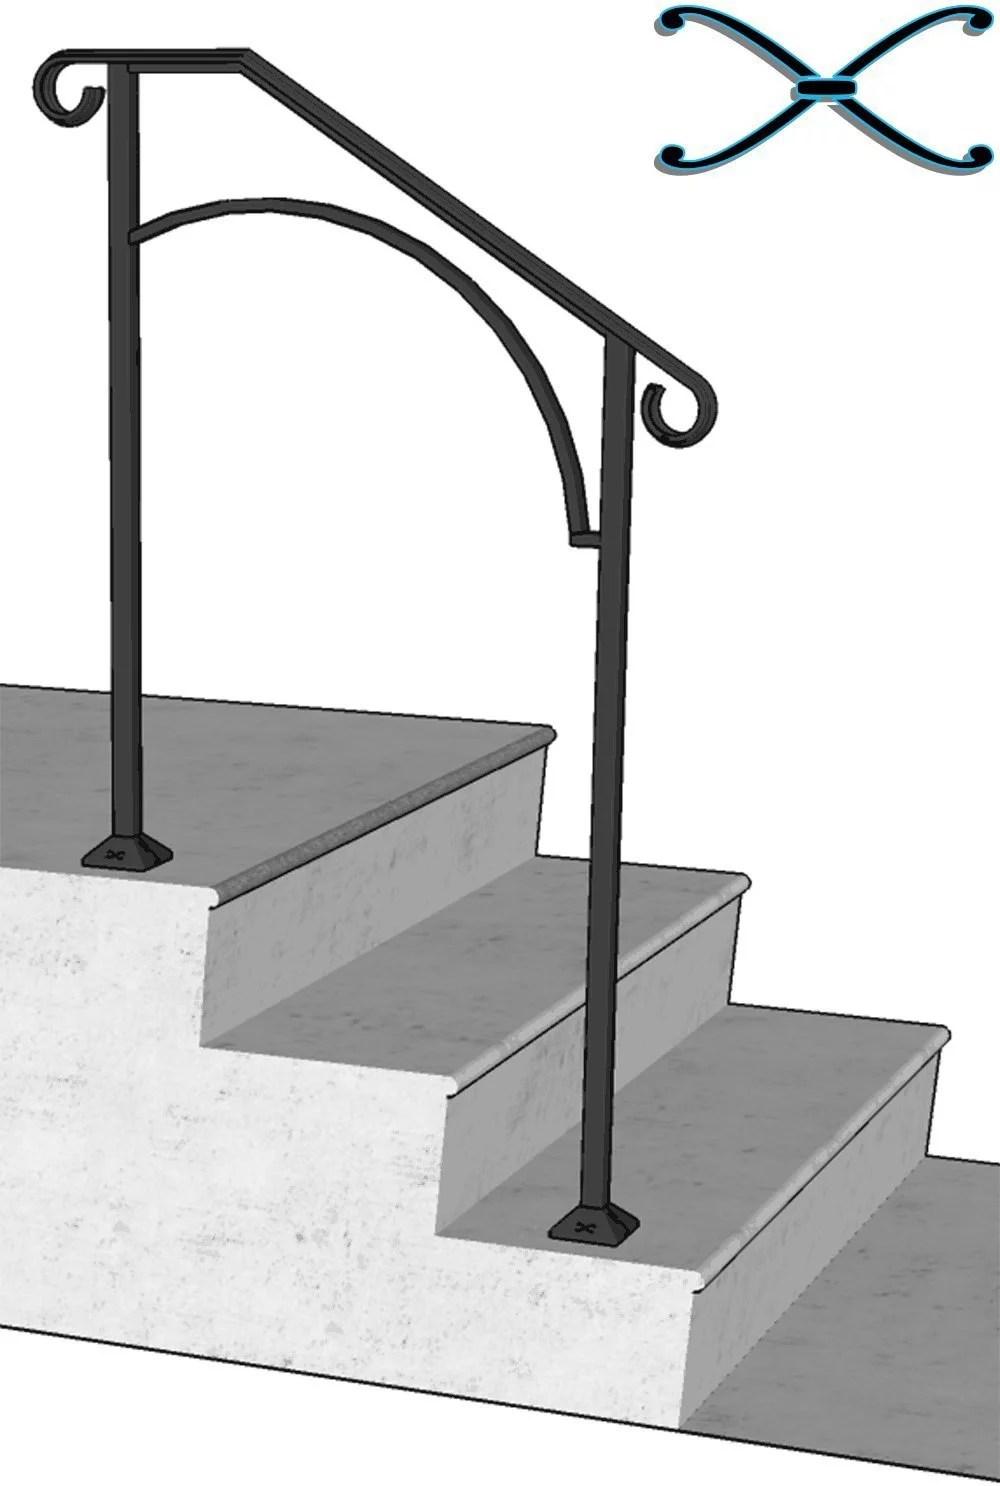 Iron X Handrail Arch 2 Concrete Steps Walmart Com Walmart Com   Handrails For Concrete Steps   Deck Stair   Ada   Wood   7 Hand   Concrete Entrance